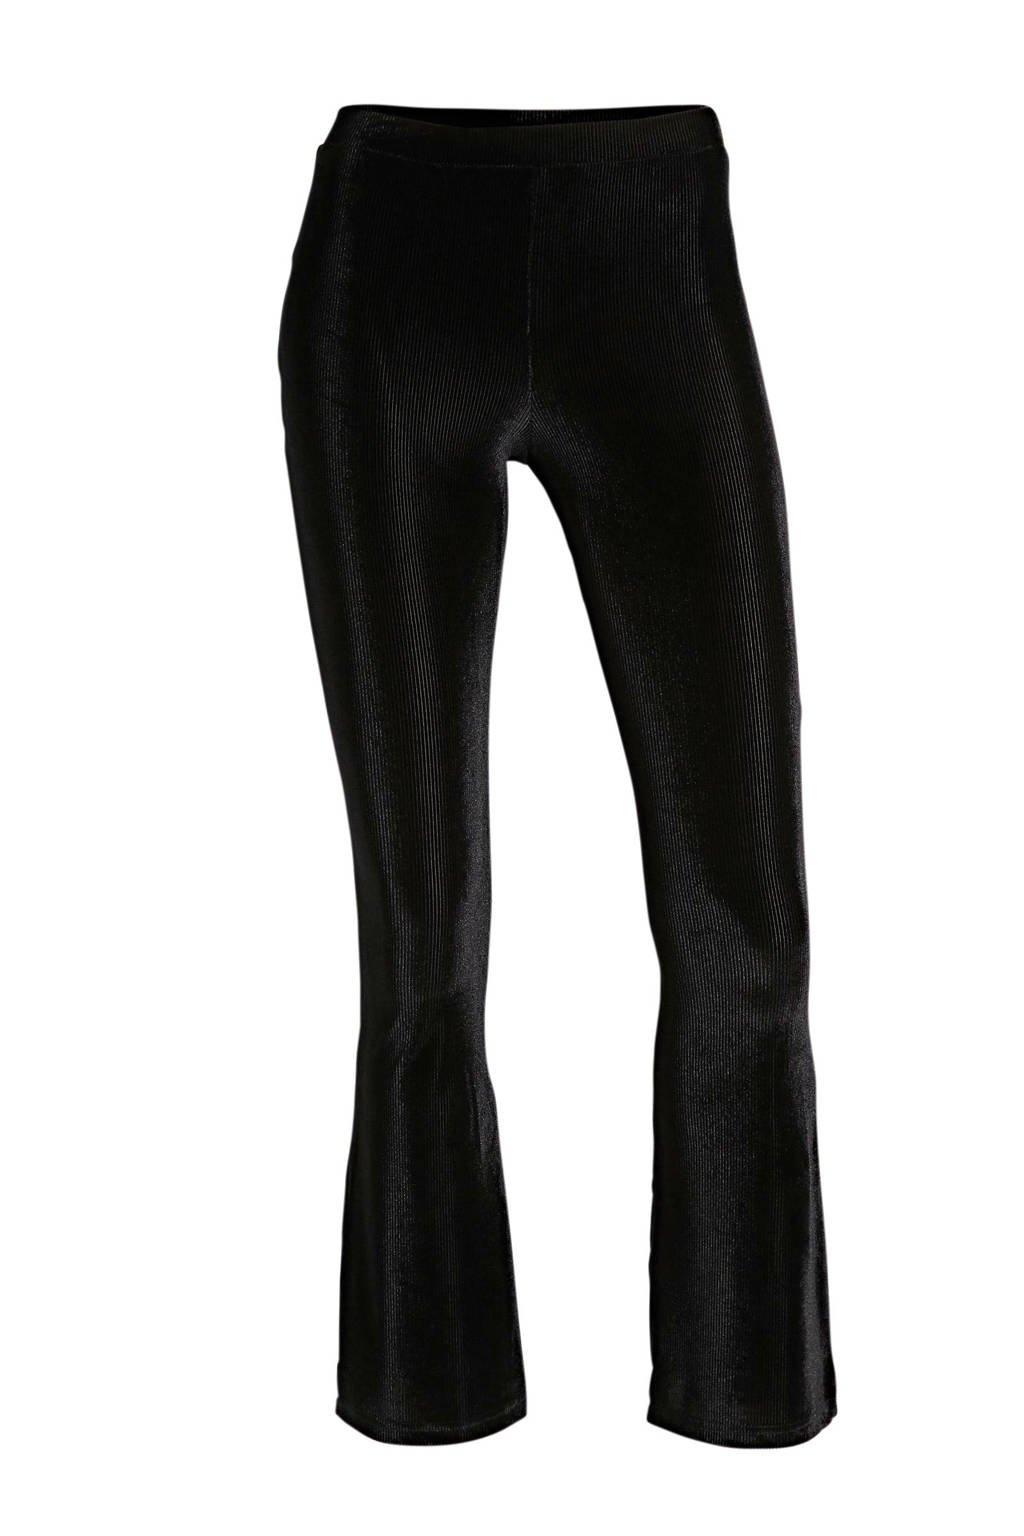 LMTD velours broek Sals zwart, Zwart